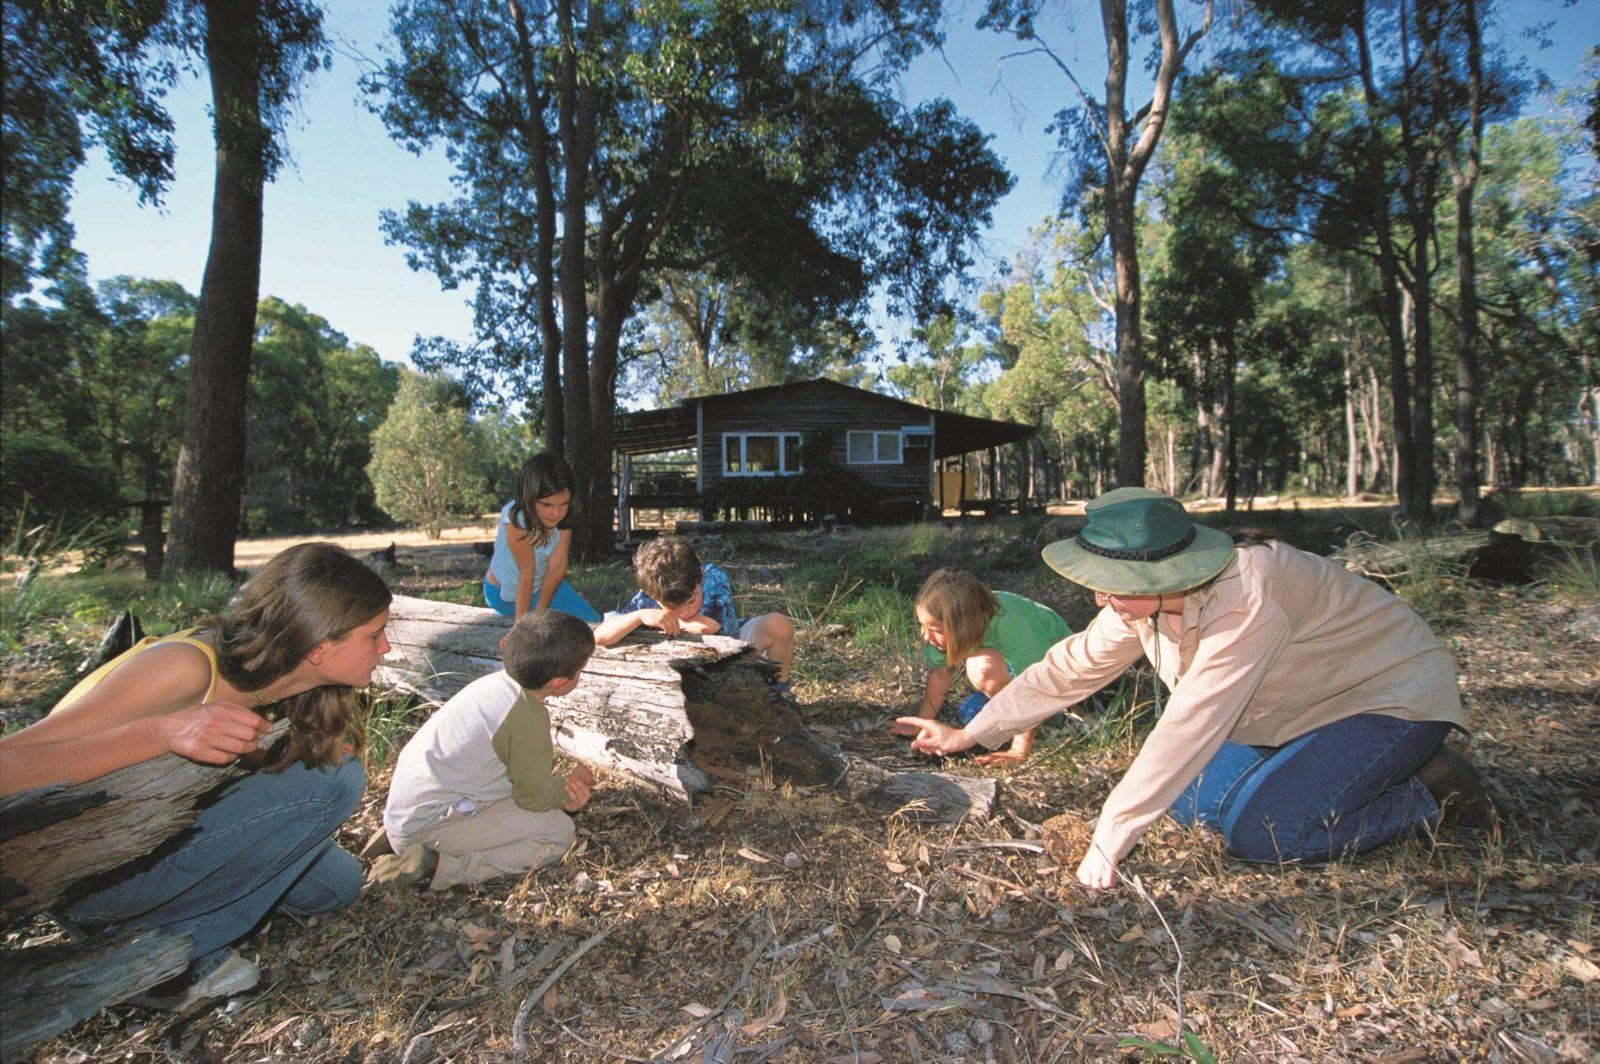 Chidlow, Western Australia